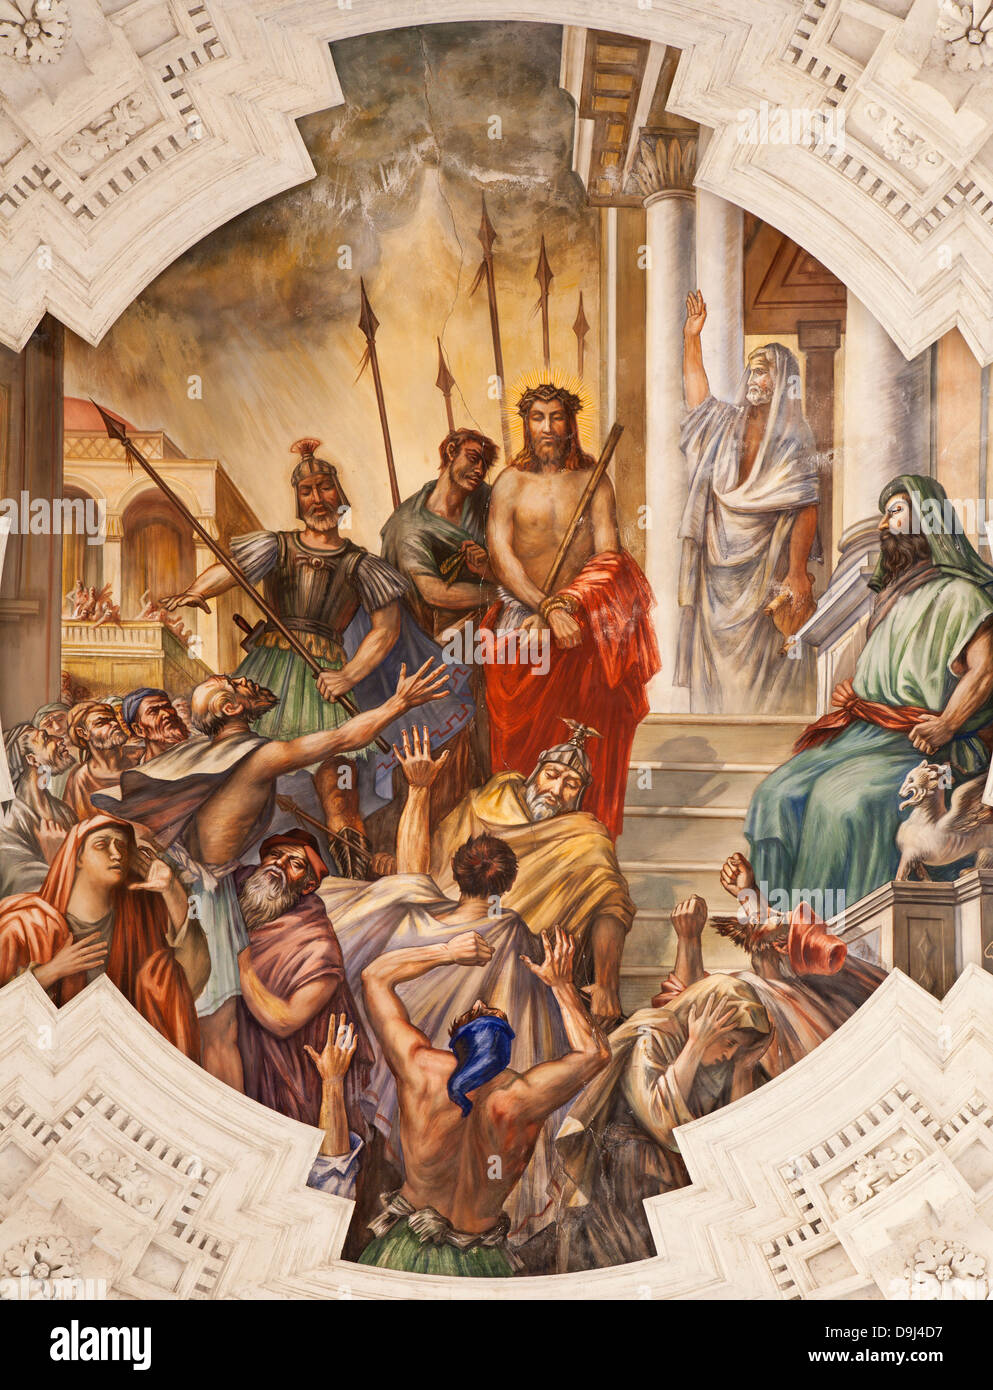 PALERMO - APRIL 8: Fresco of Jesus for Pilatus scene on ceiling of side nave in church La chiesa del Gesu - Stock Image